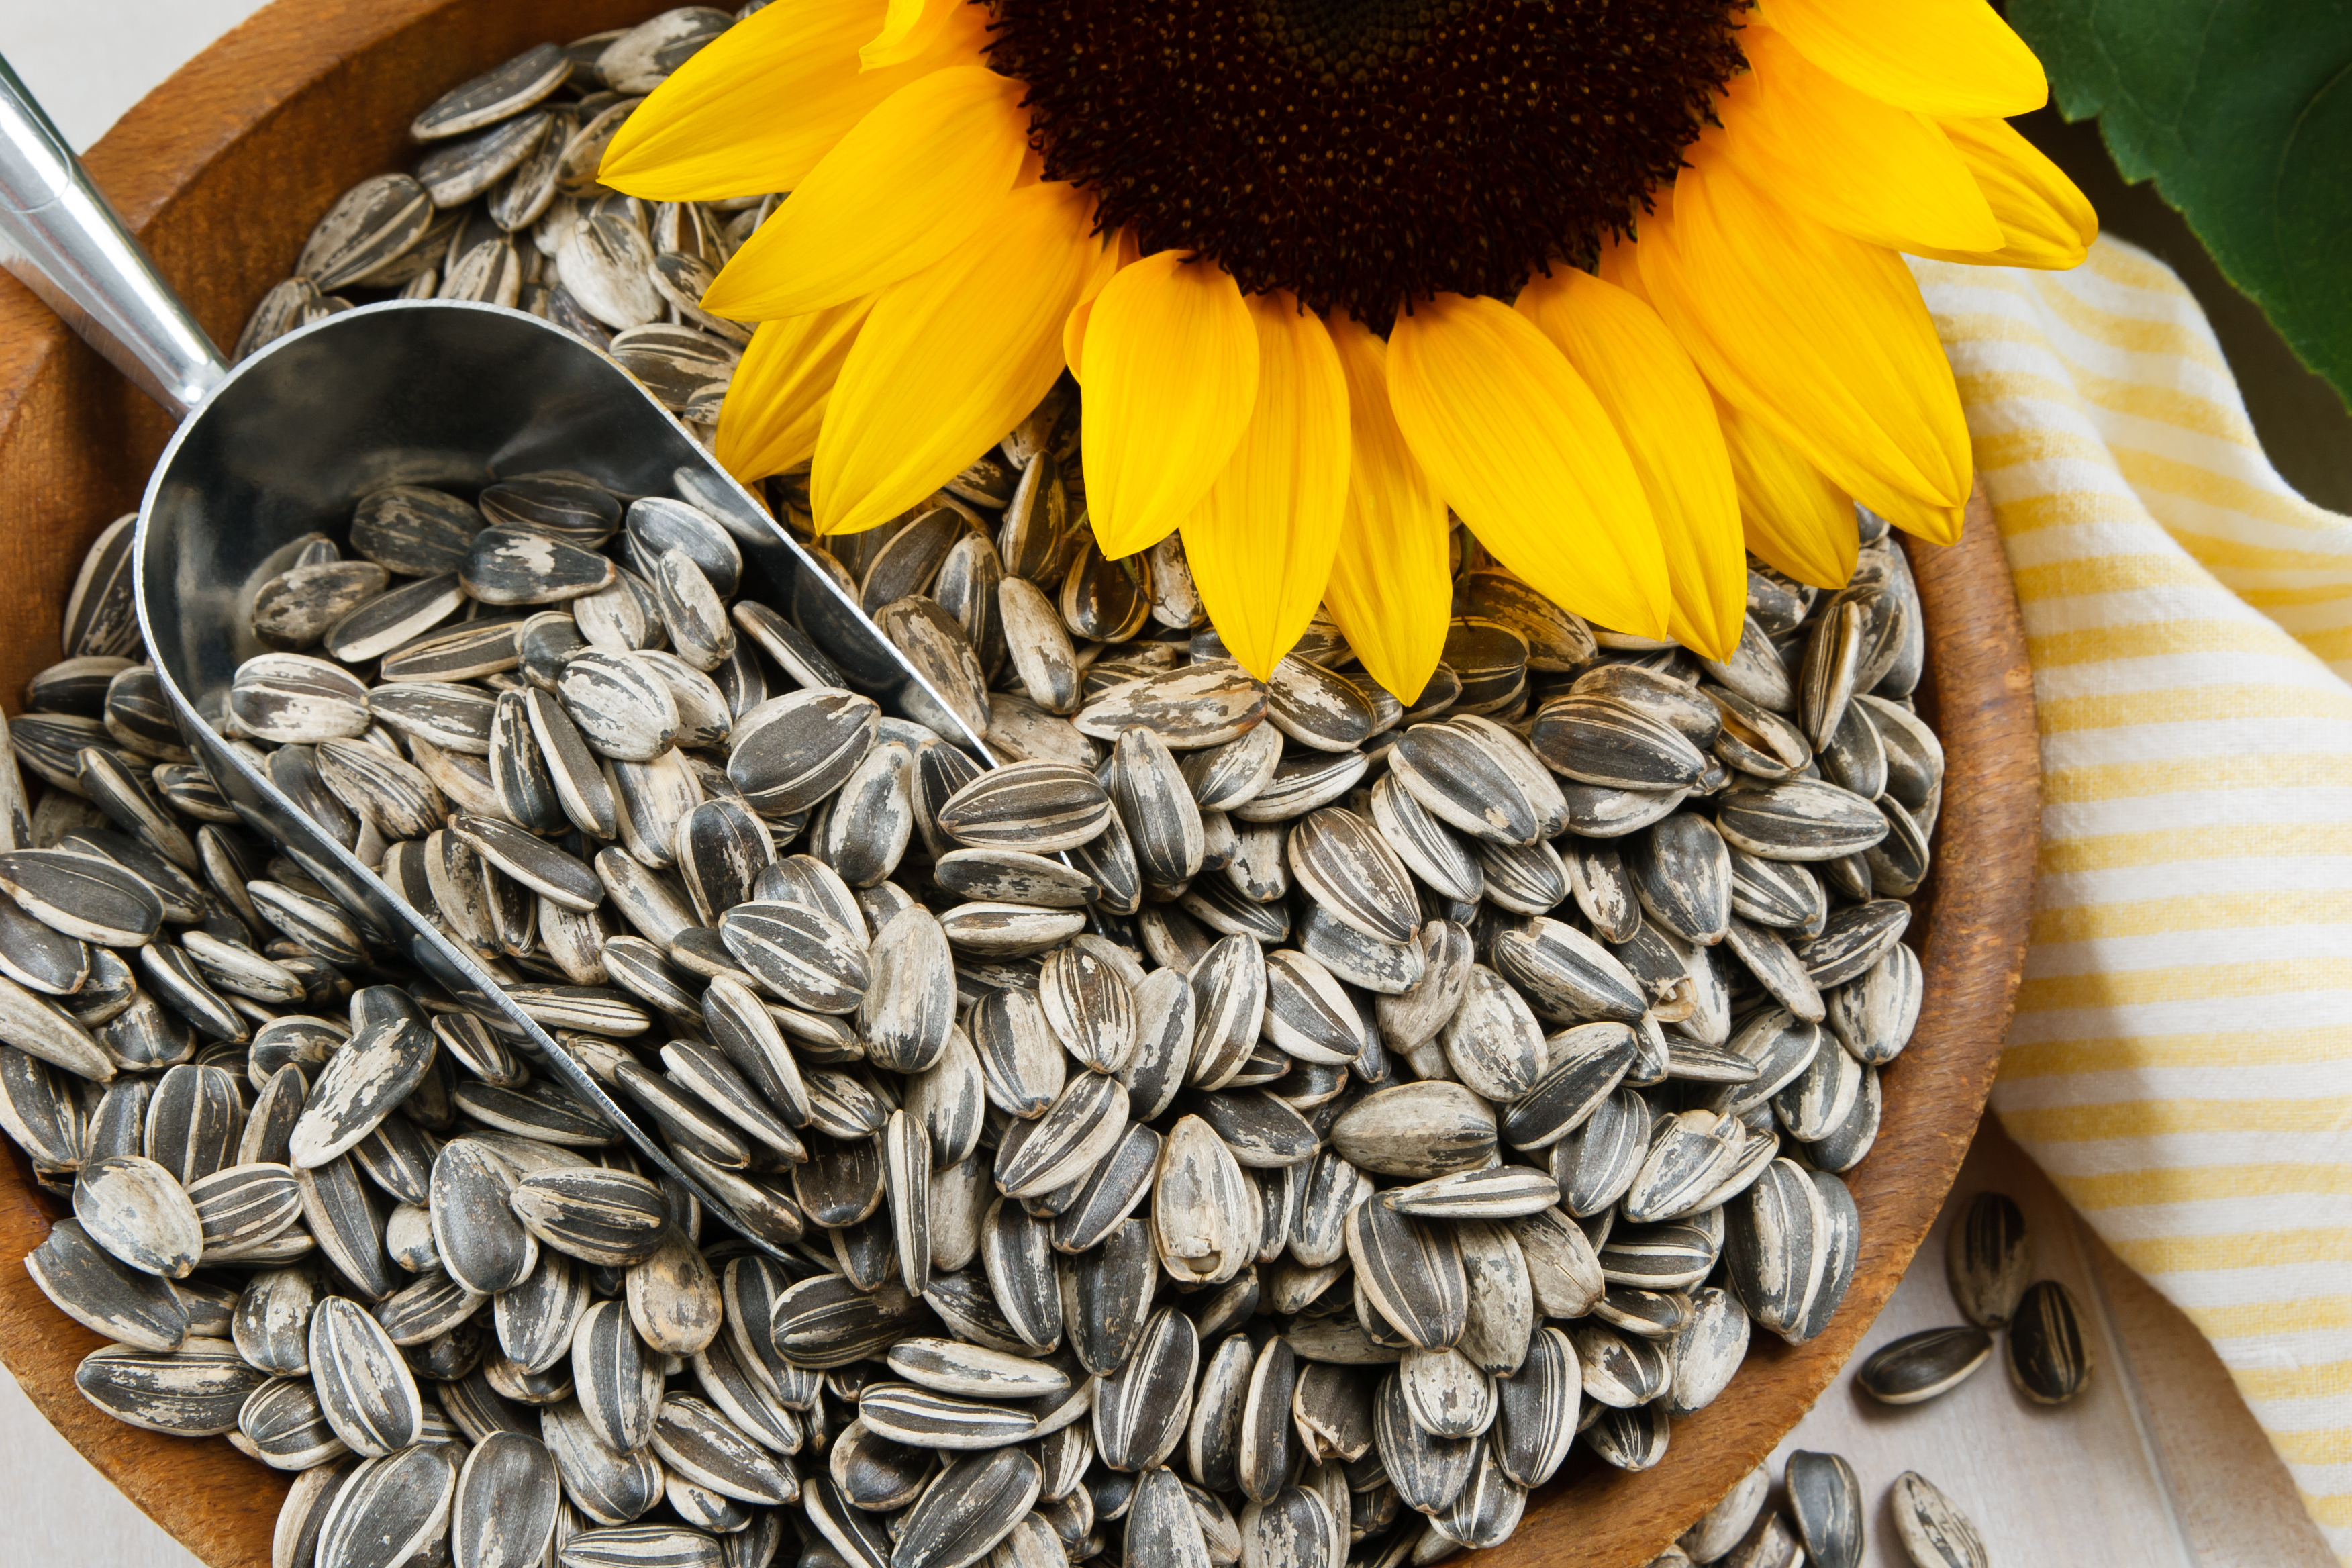 como plantar girassol orgânico: plantar semente de girassol